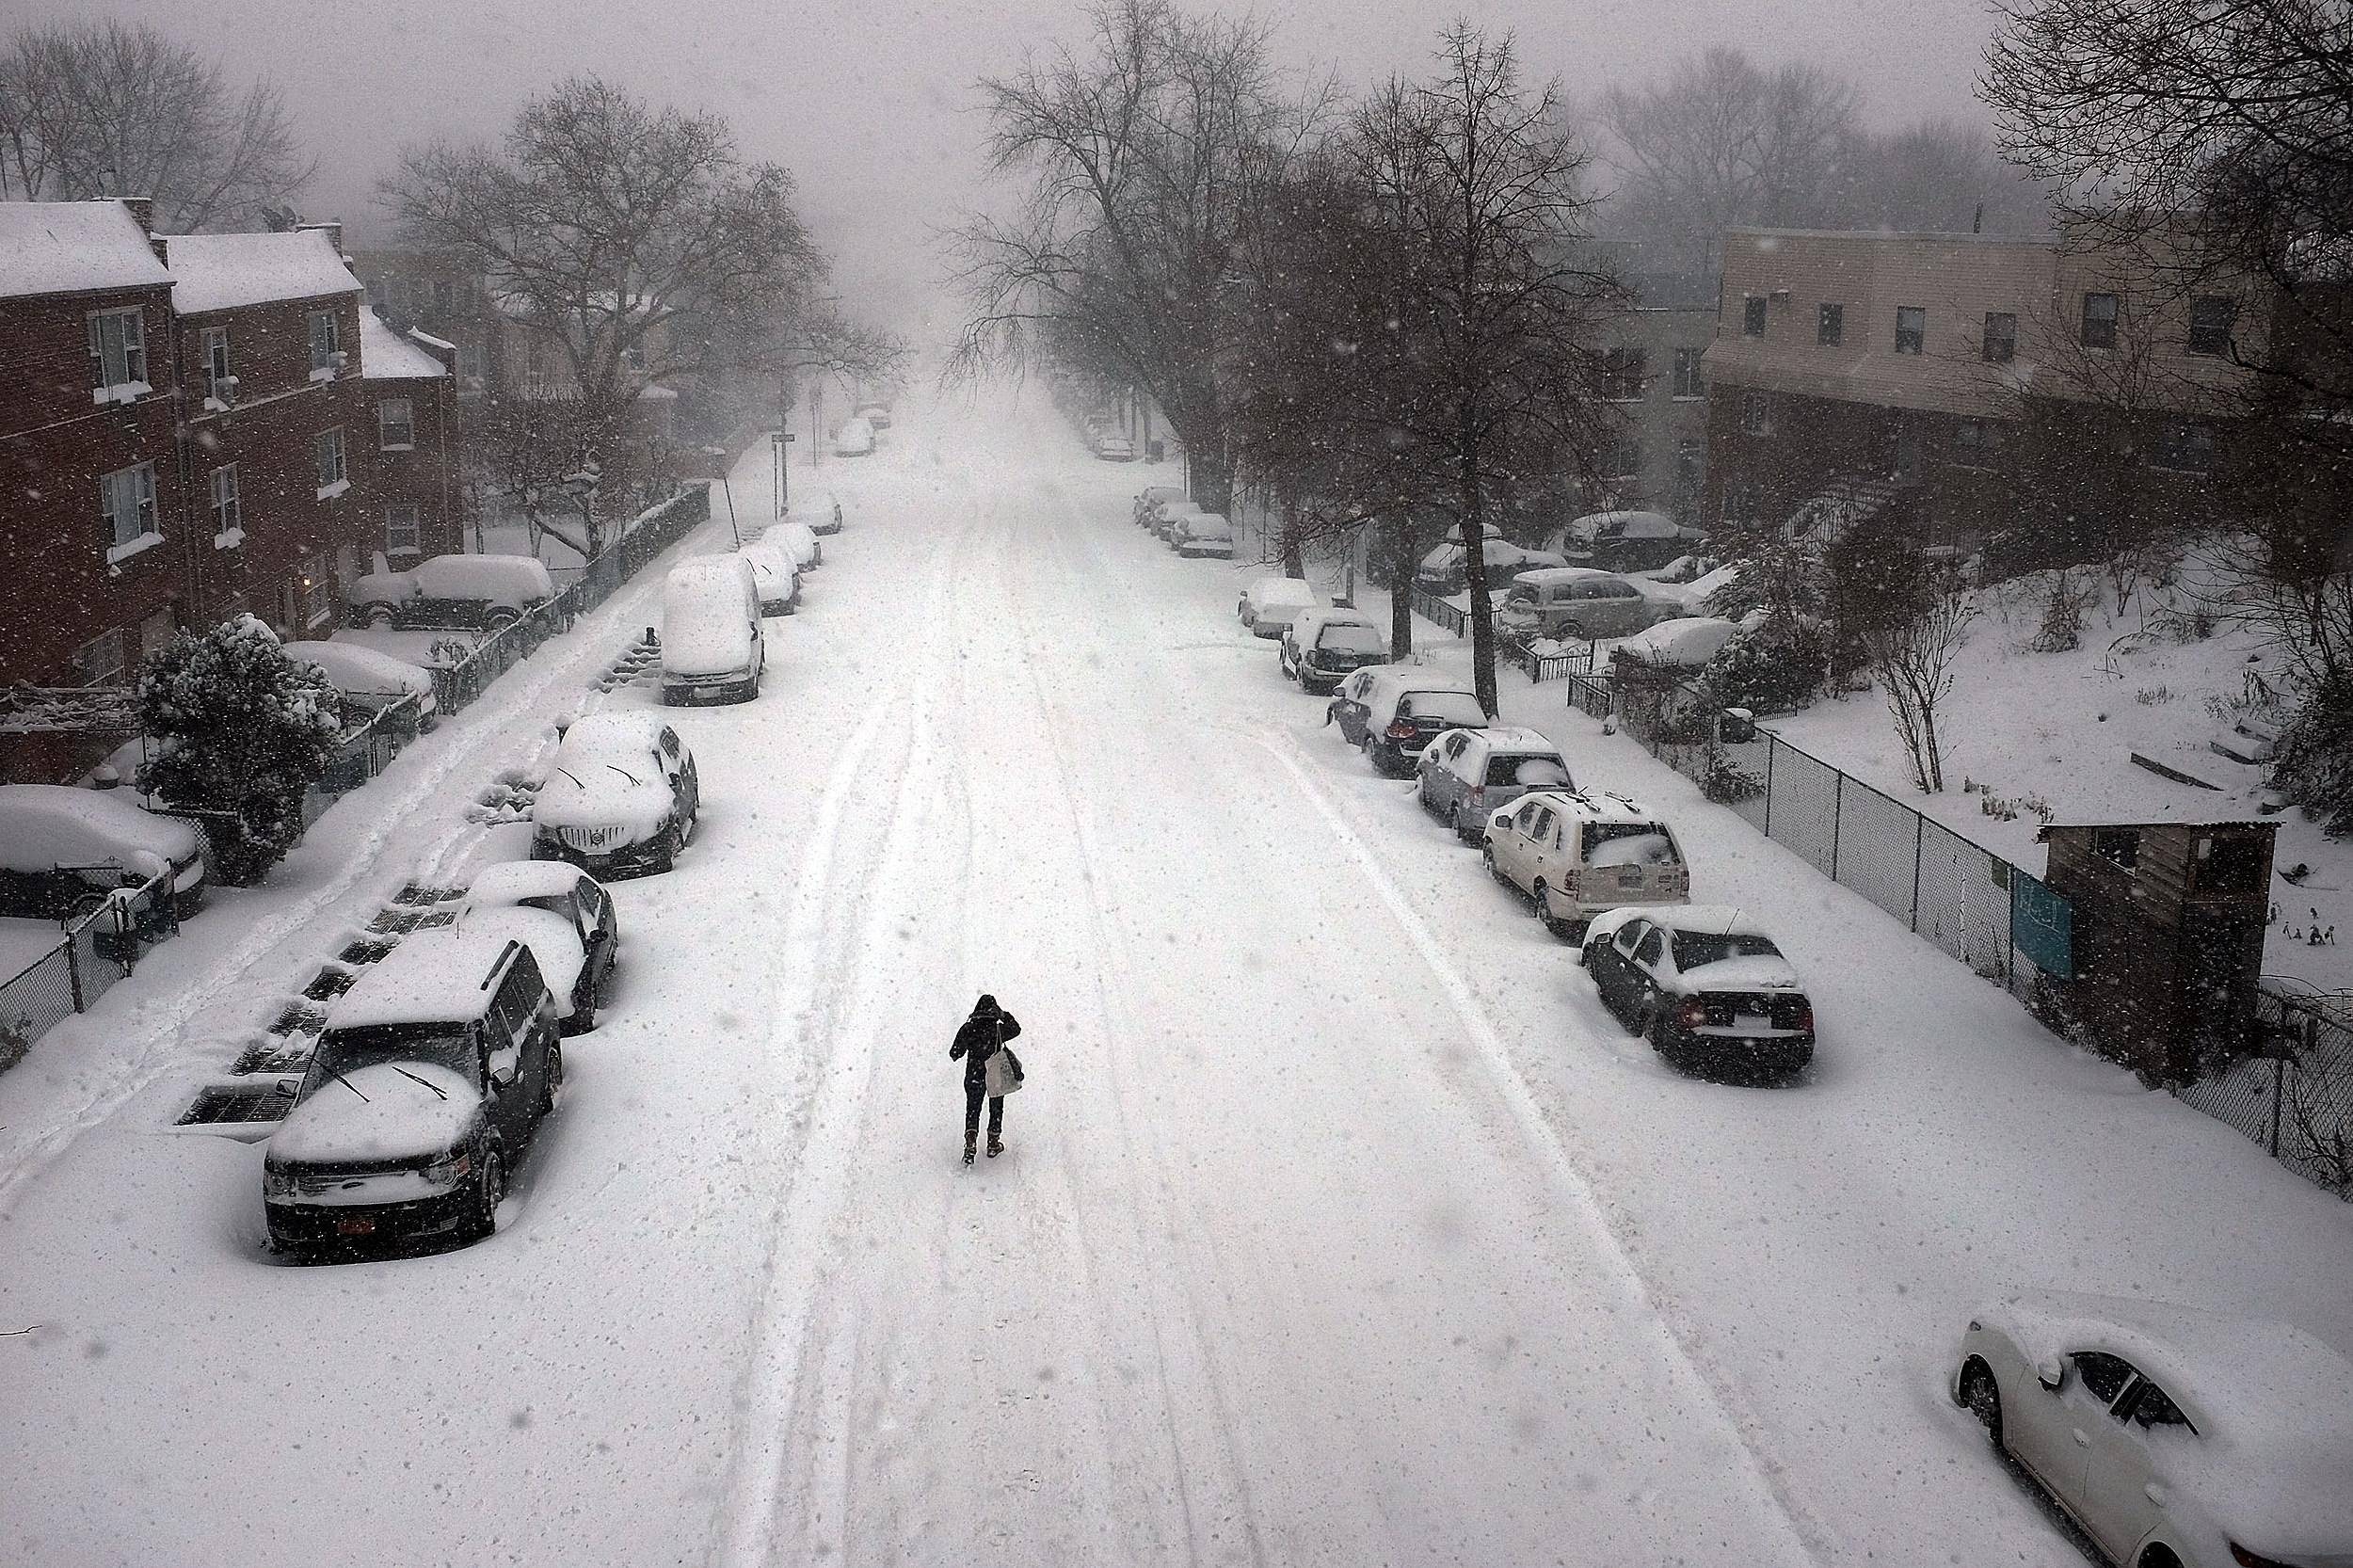 Best snow day movies